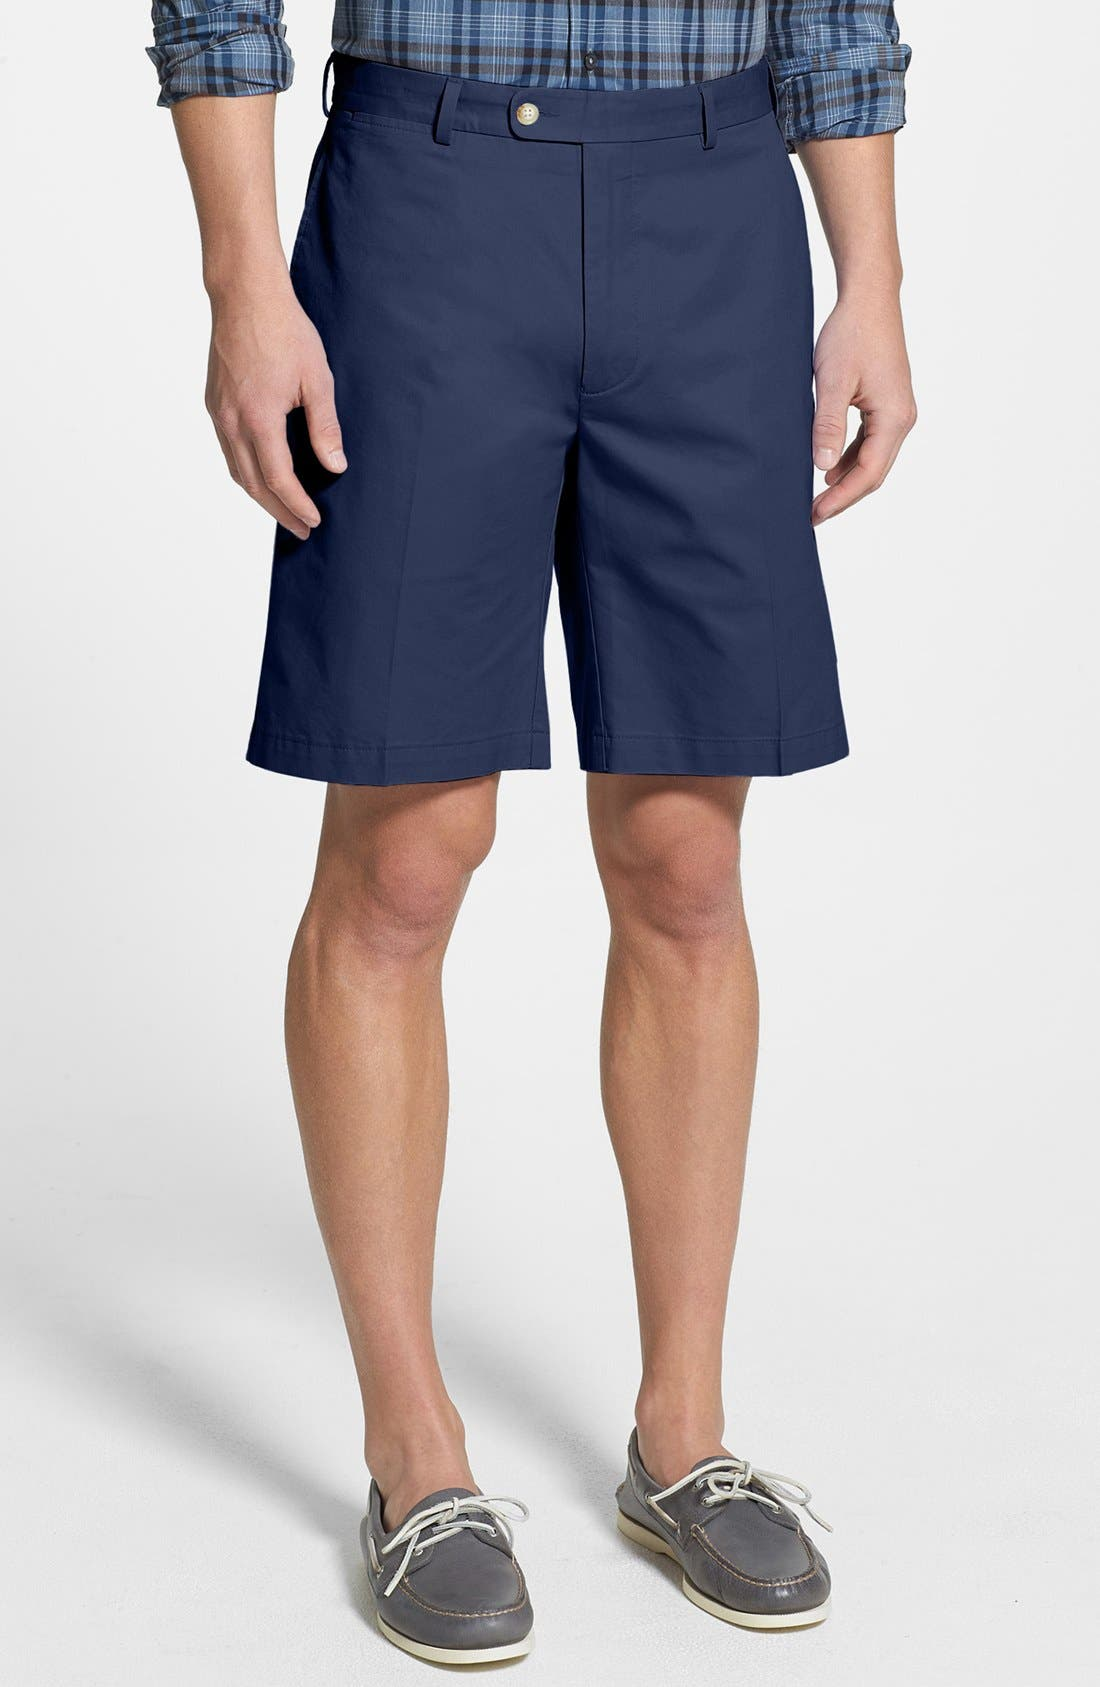 Main Image - Peter Millar Lightweight Cotton Shorts